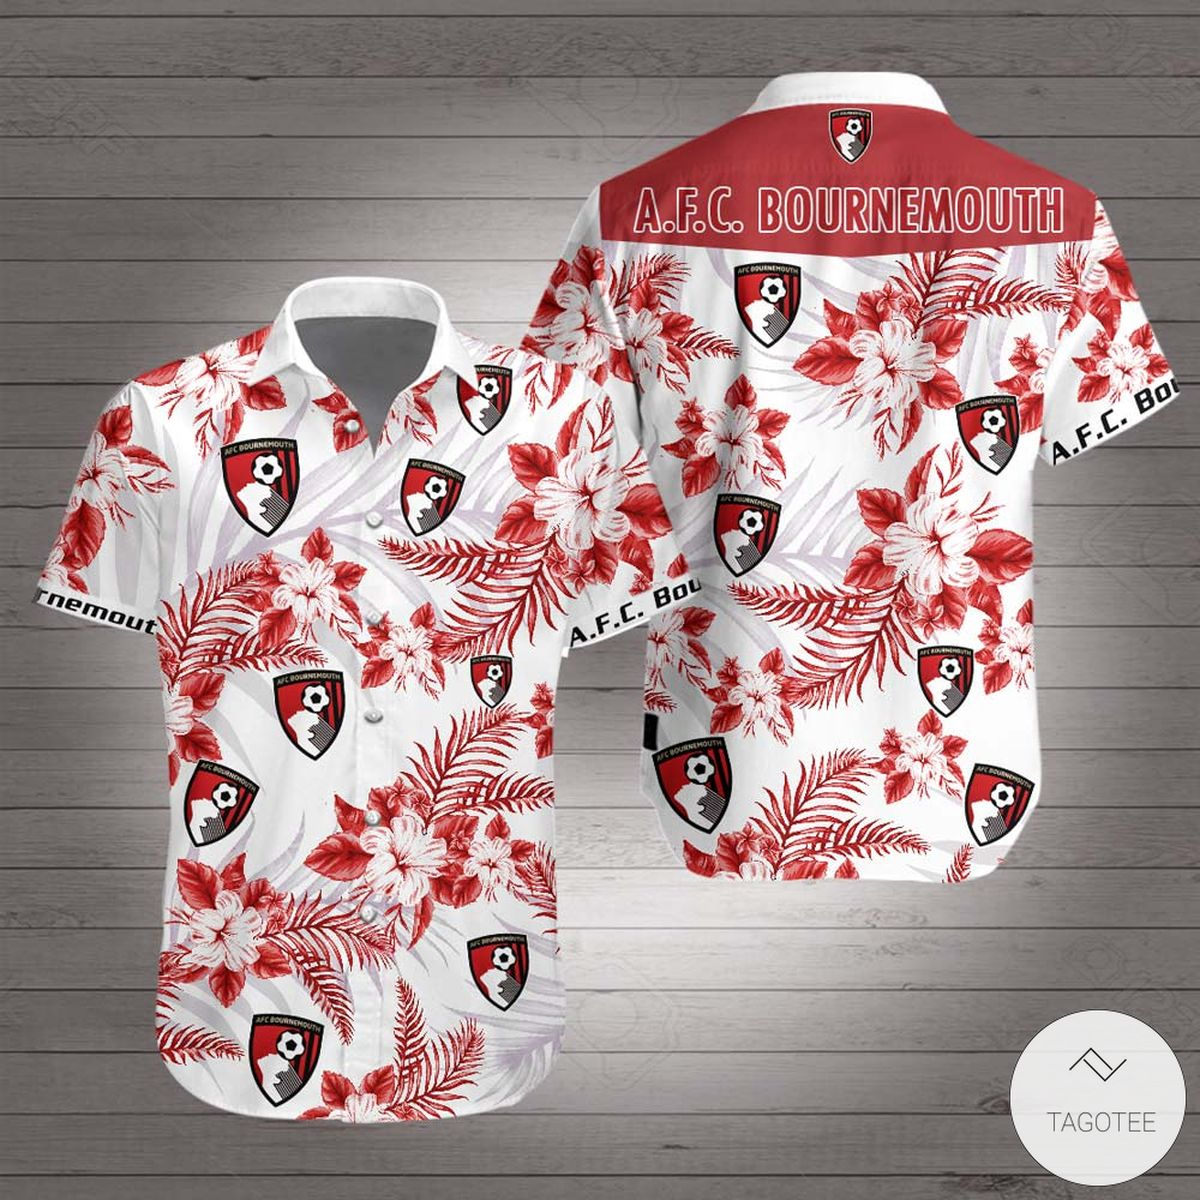 A.F.C. Bournemouth Hawaiian Shirt